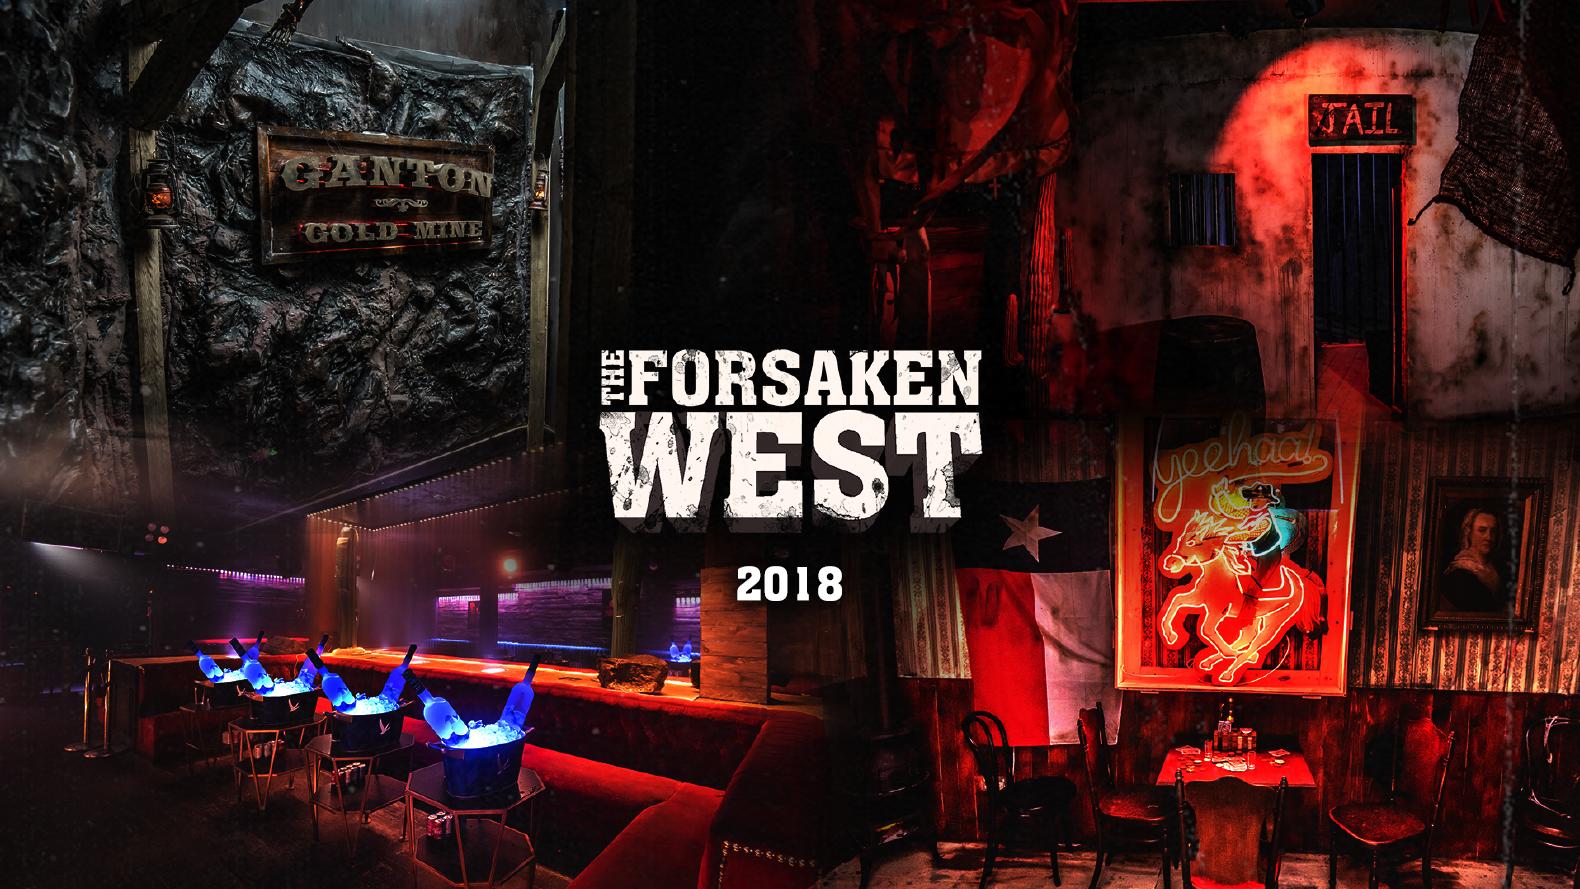 The Foresaken West 2018